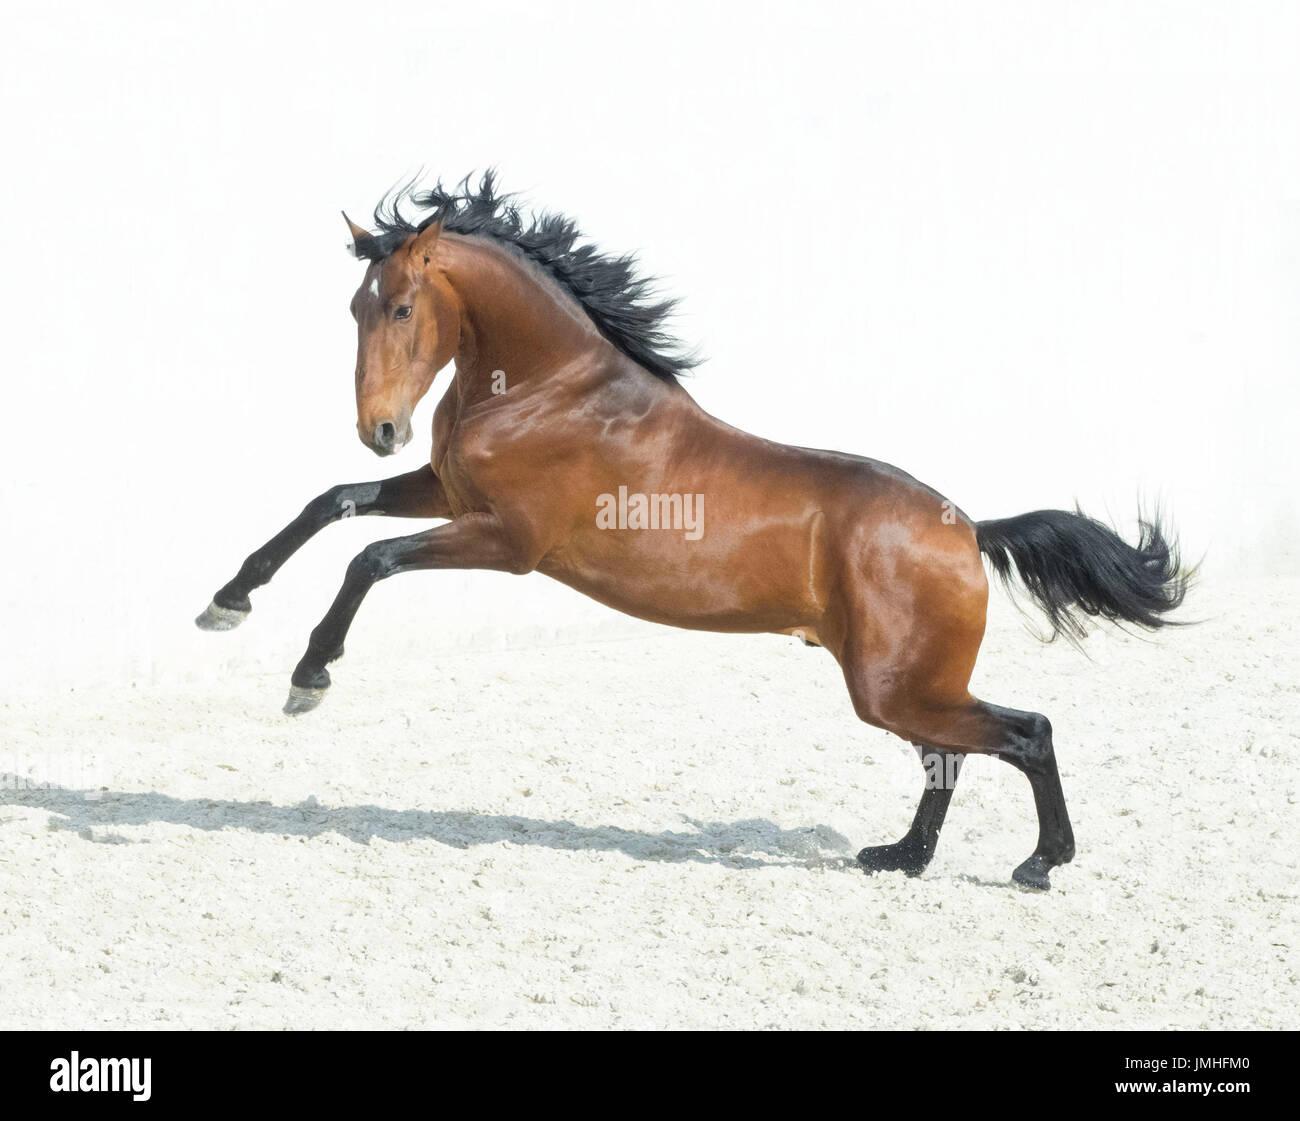 Bay Horse prancing - Stock Image